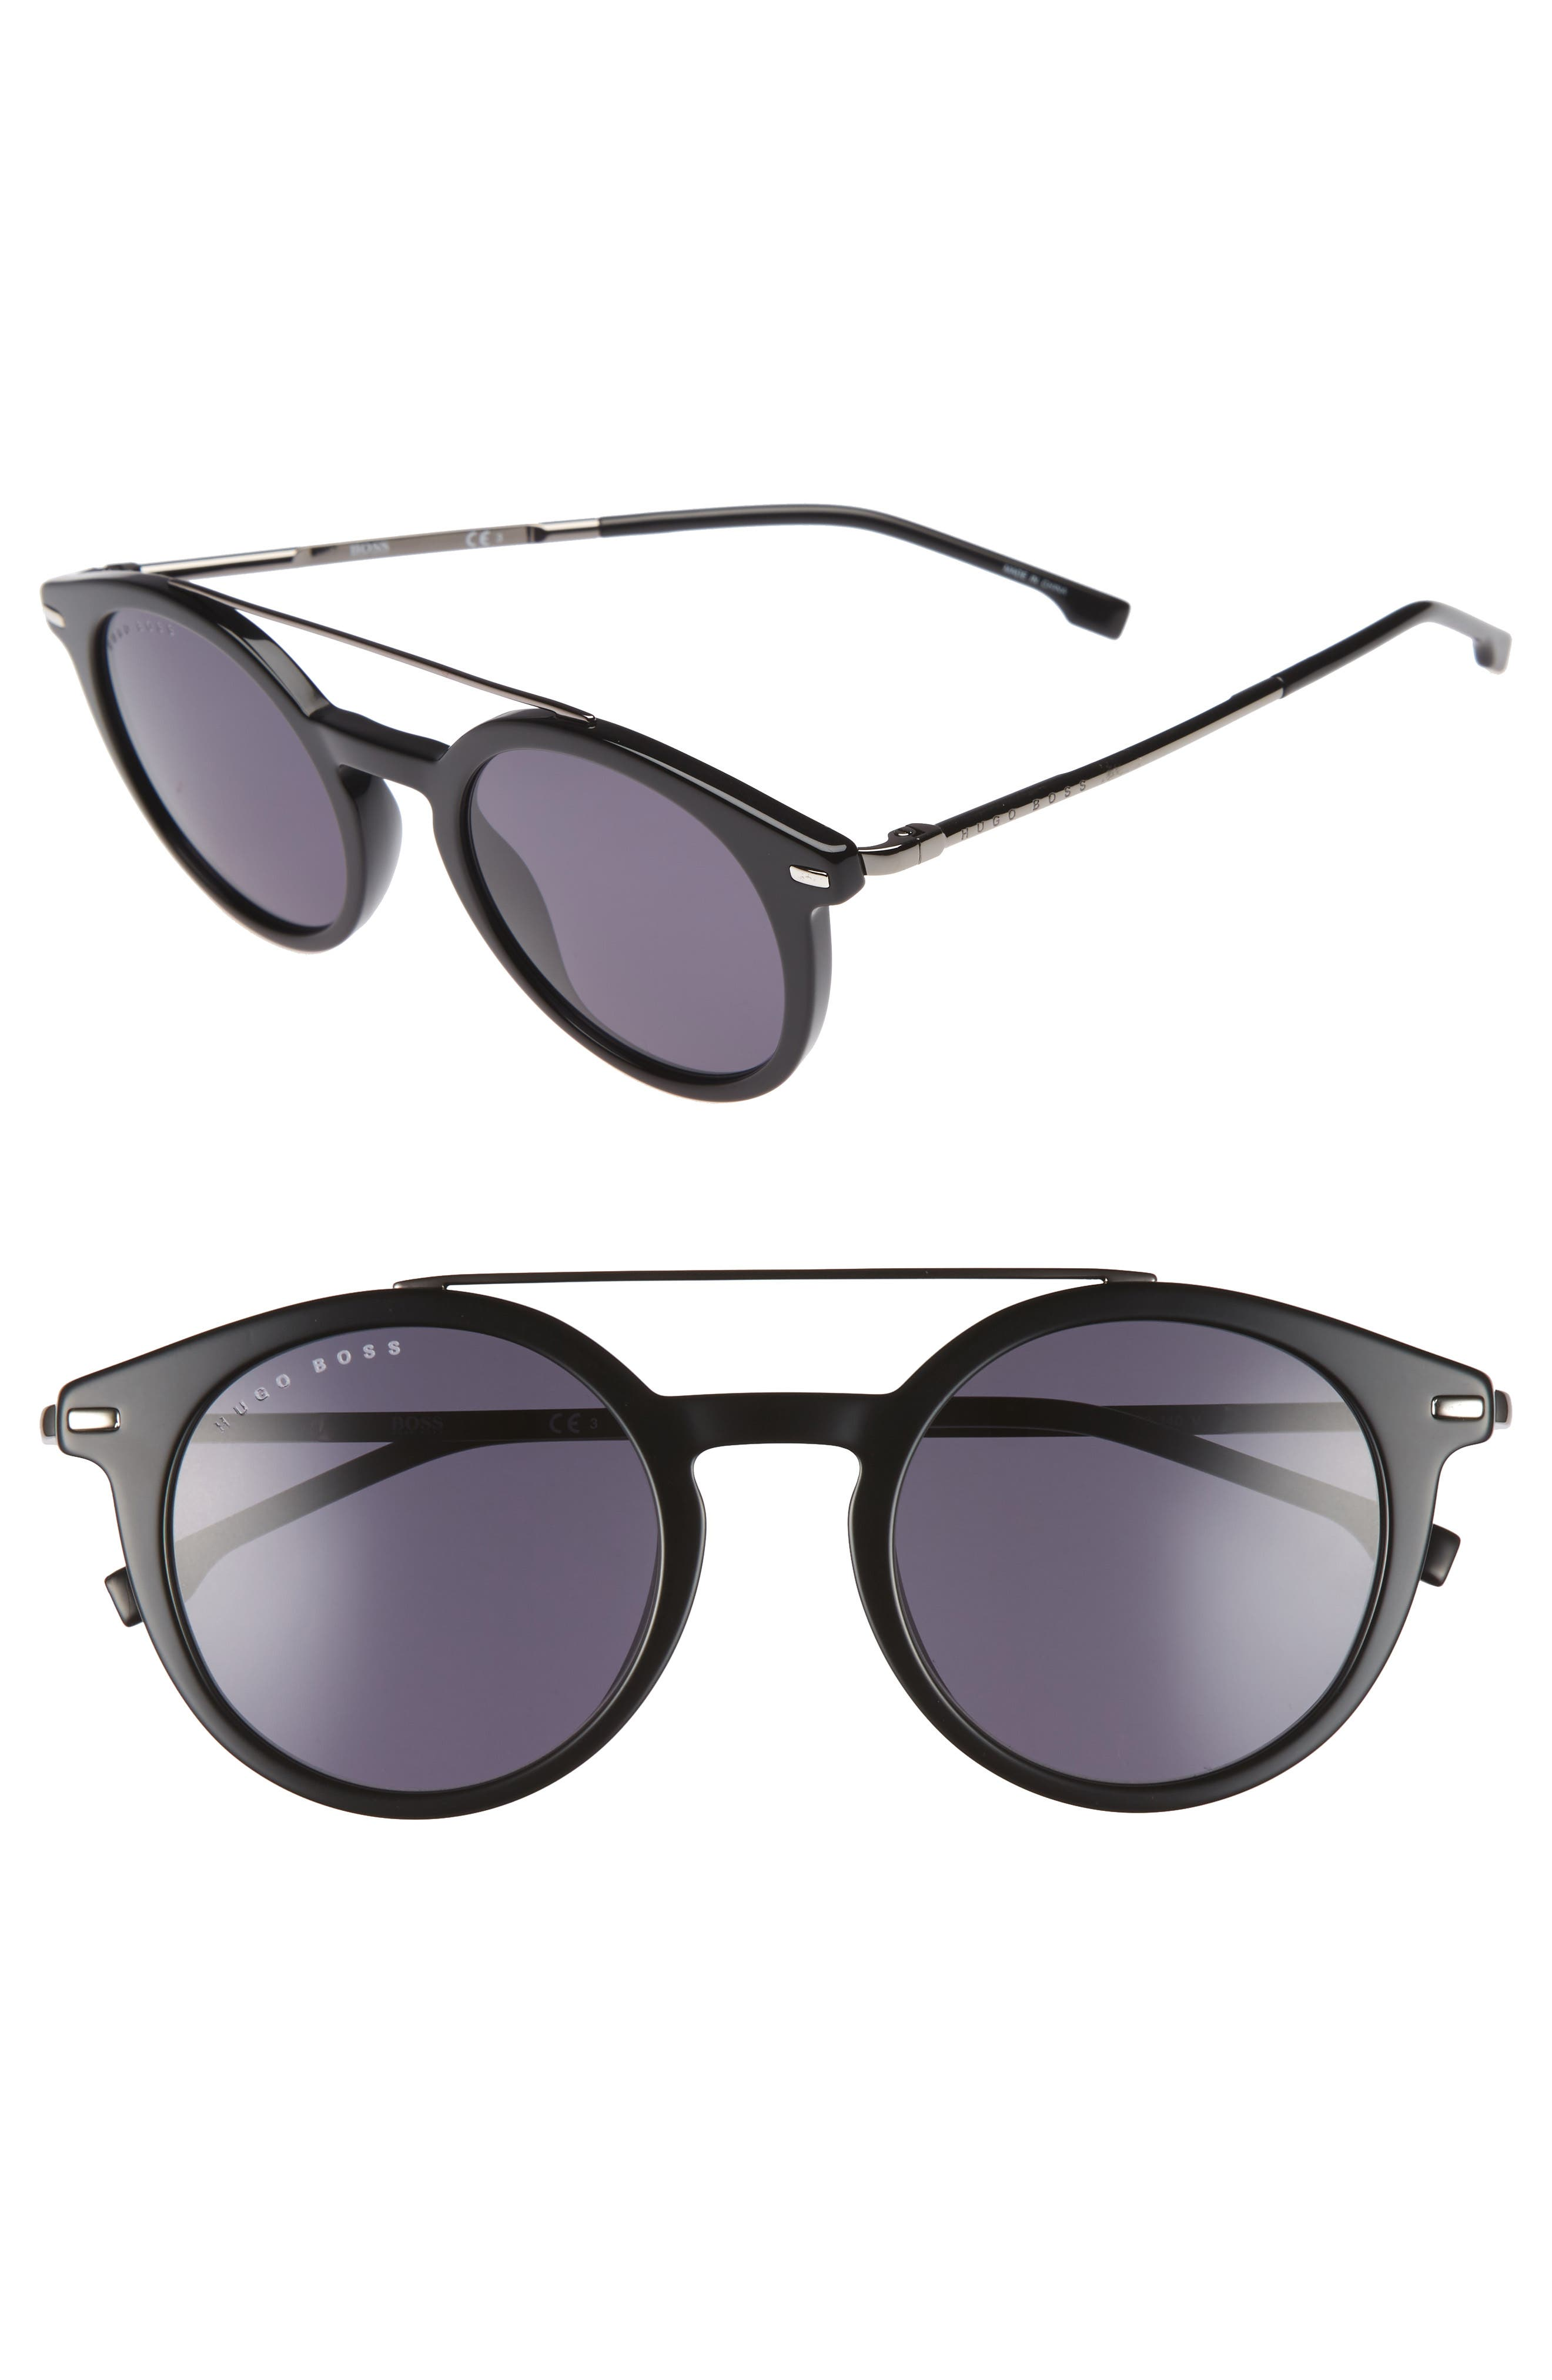 BOSS B0926S 49mm Polarized Sunglasses